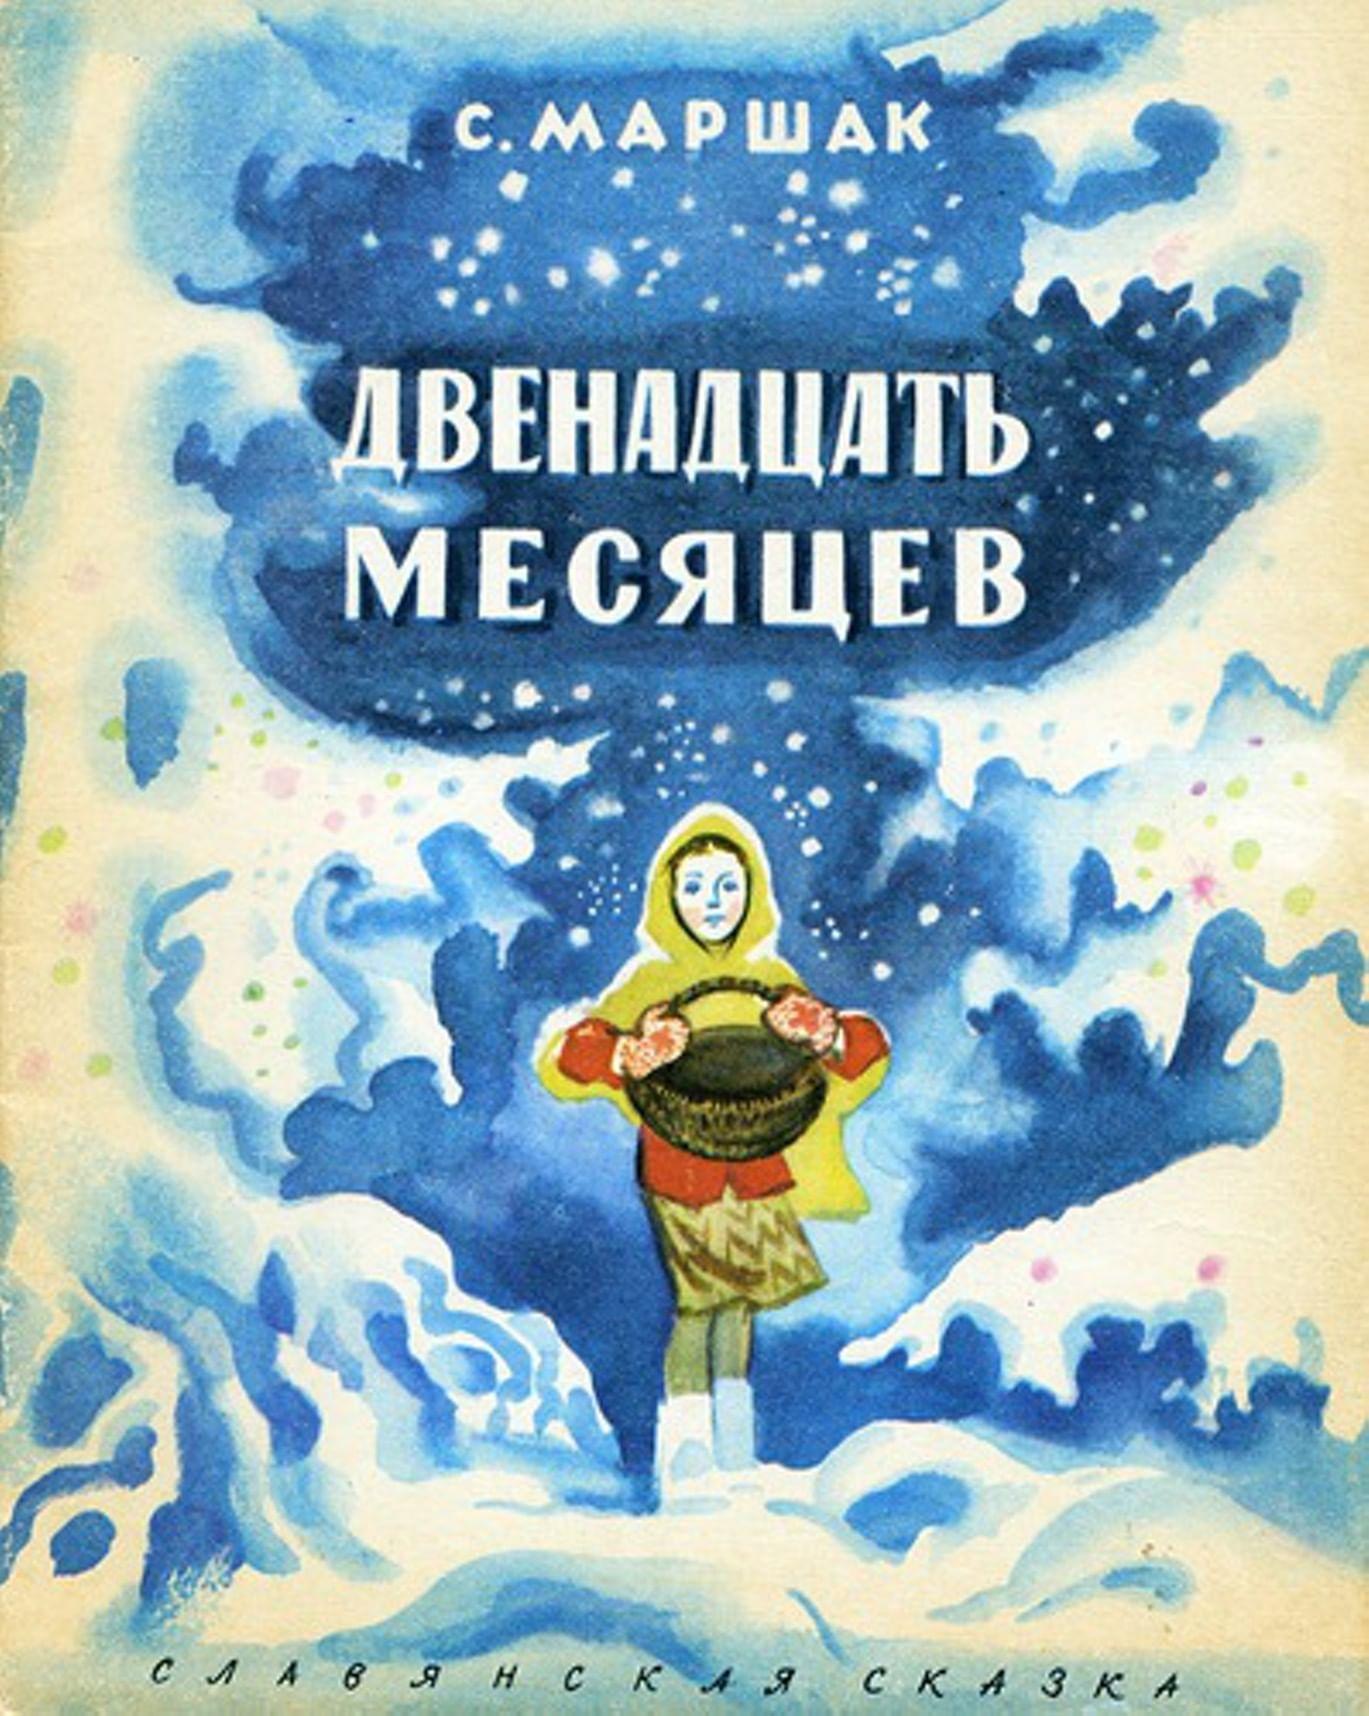 Самуил Маршак. Галерея 2